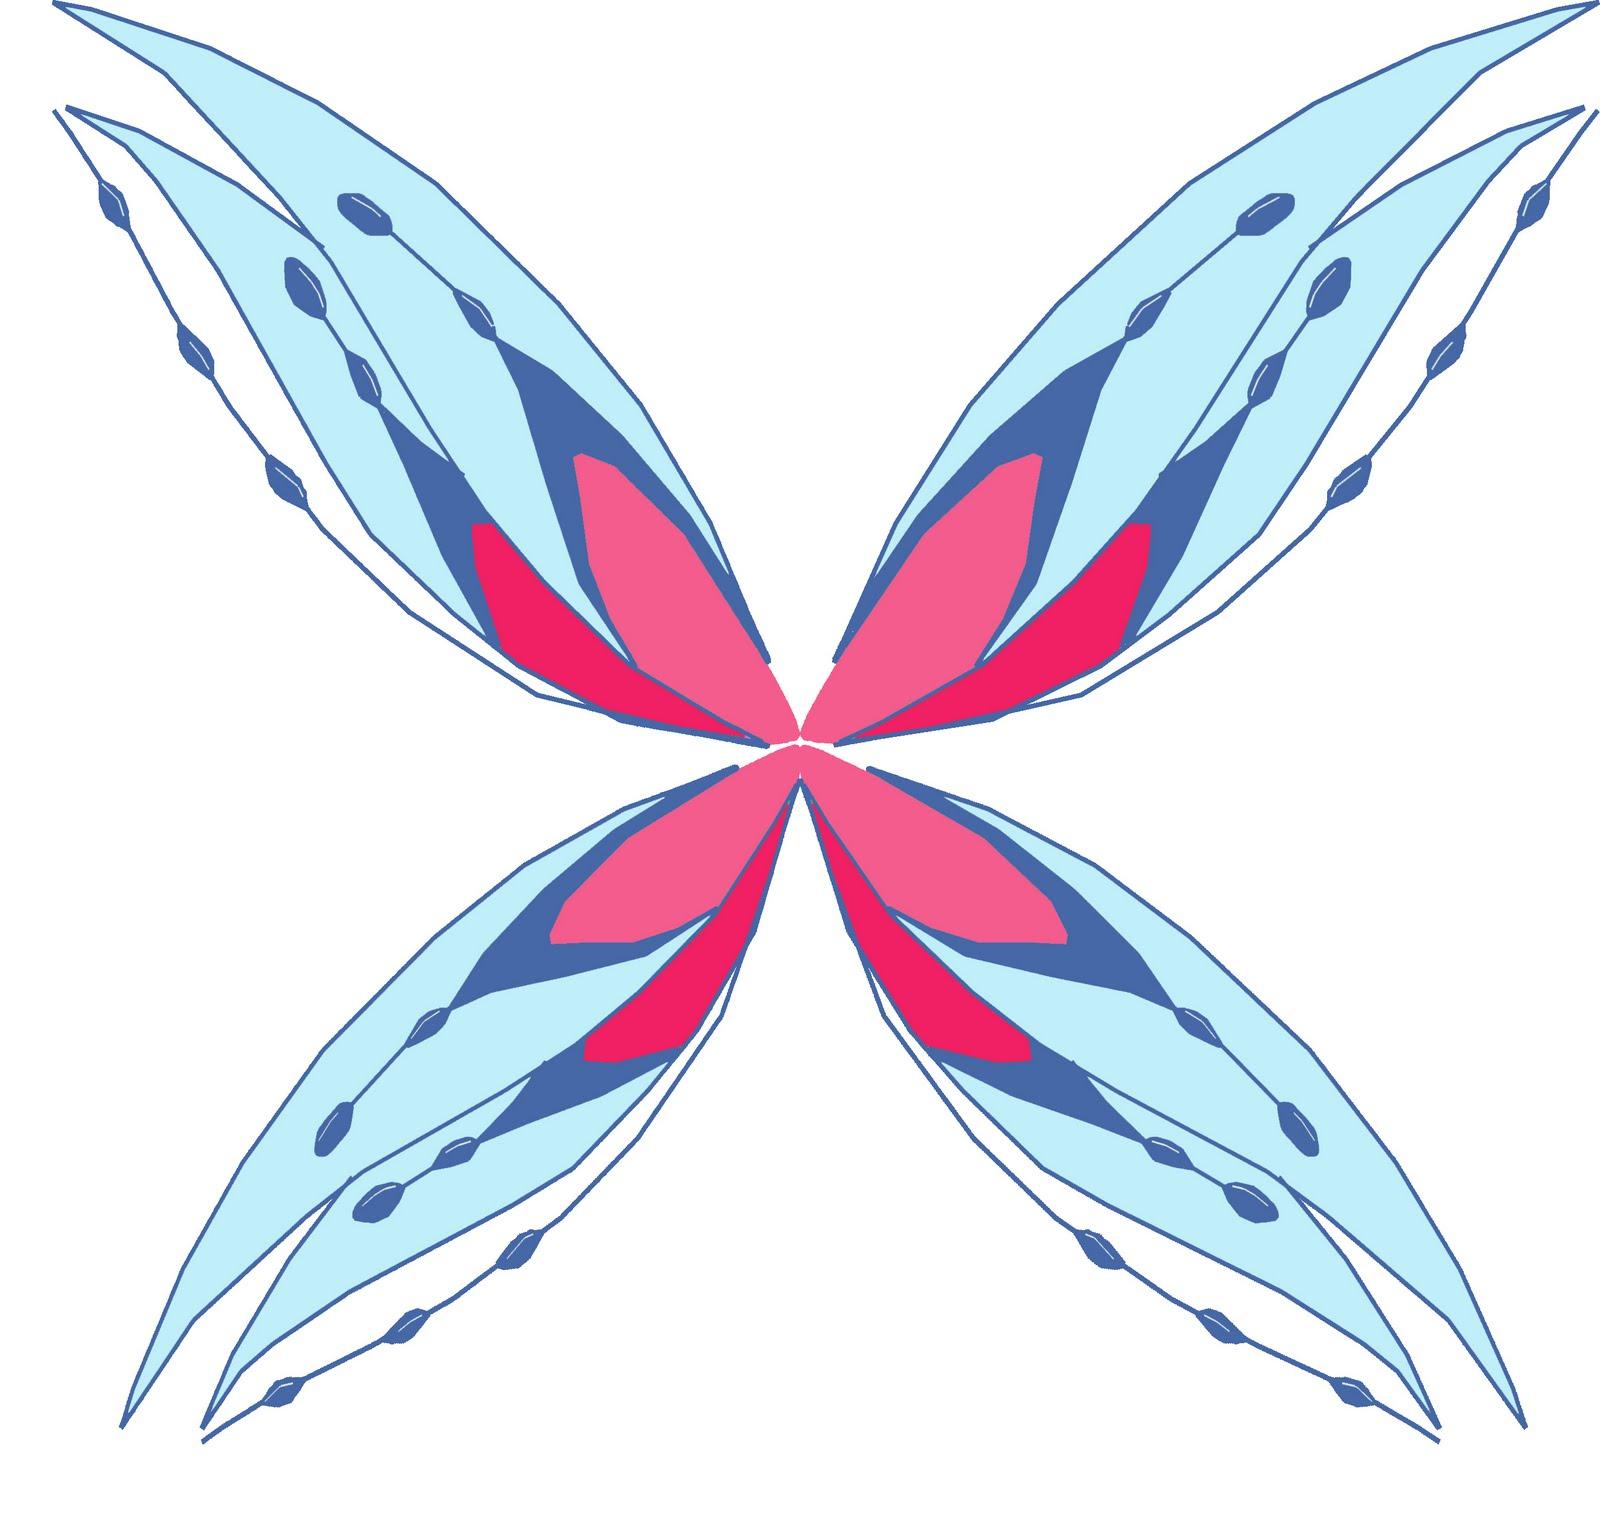 http://3.bp.blogspot.com/_J1eKITQ_ojE/S6yv3E5w2_I/AAAAAAAABF0/Q1cmNsgud_Y/s1600/zoomix_musa.jpg